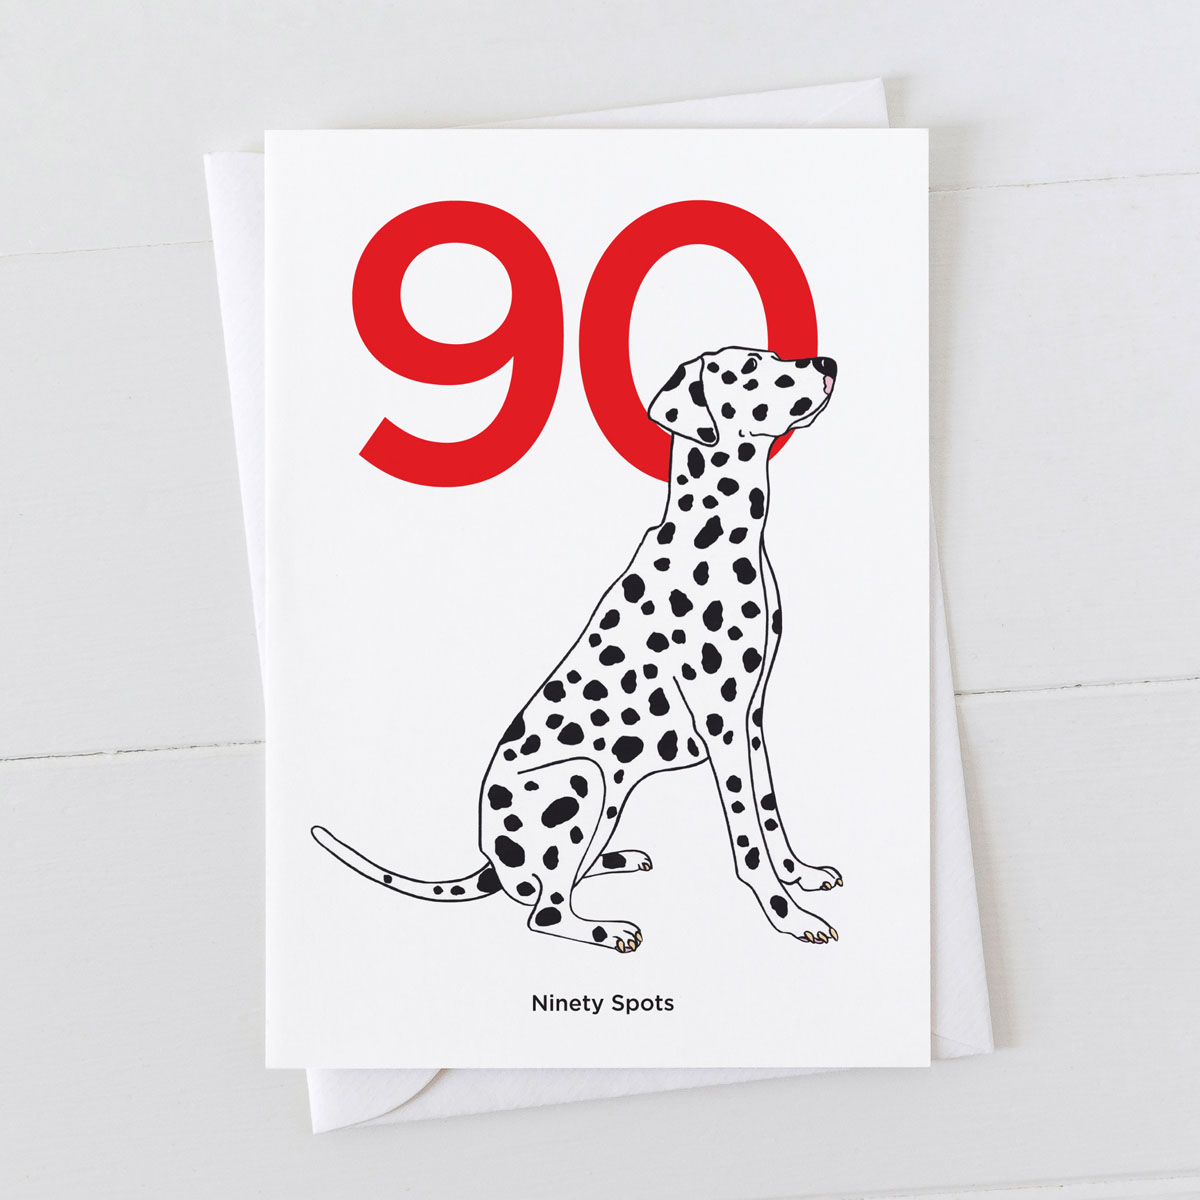 Age Ninety Dalmatian Spot Greeting Card